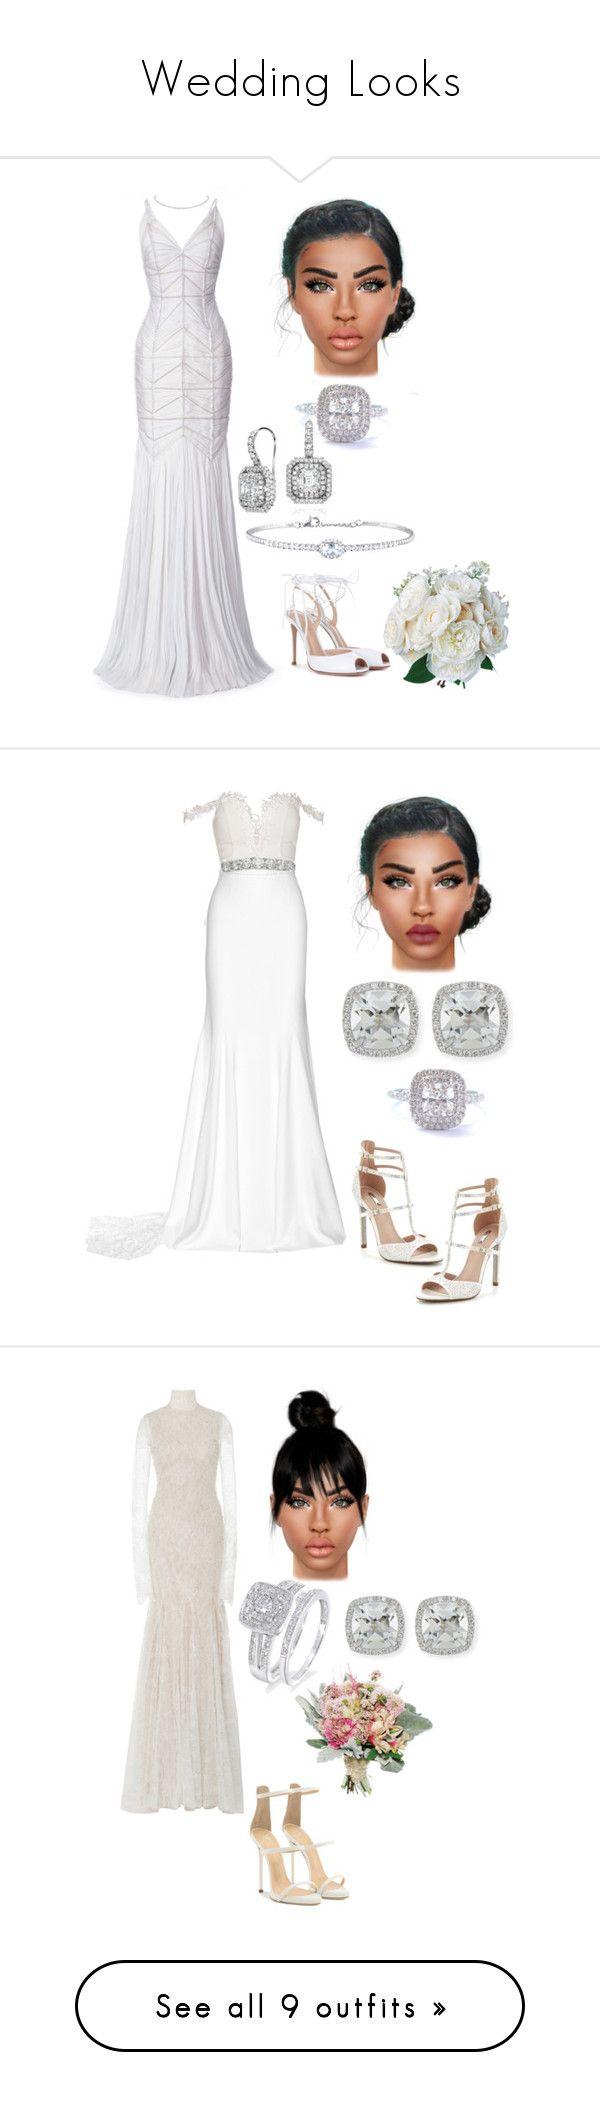 """Wedding Looks"" by kimba515 ❤ liked on Polyvore featuring J. Mendel, Tiffany & Co., Blue Nile, Rina Limor, Gianvito Rossi, Rime Arodaky, Carvela, Modern Bride, Frederic Sage and Vera Wang"